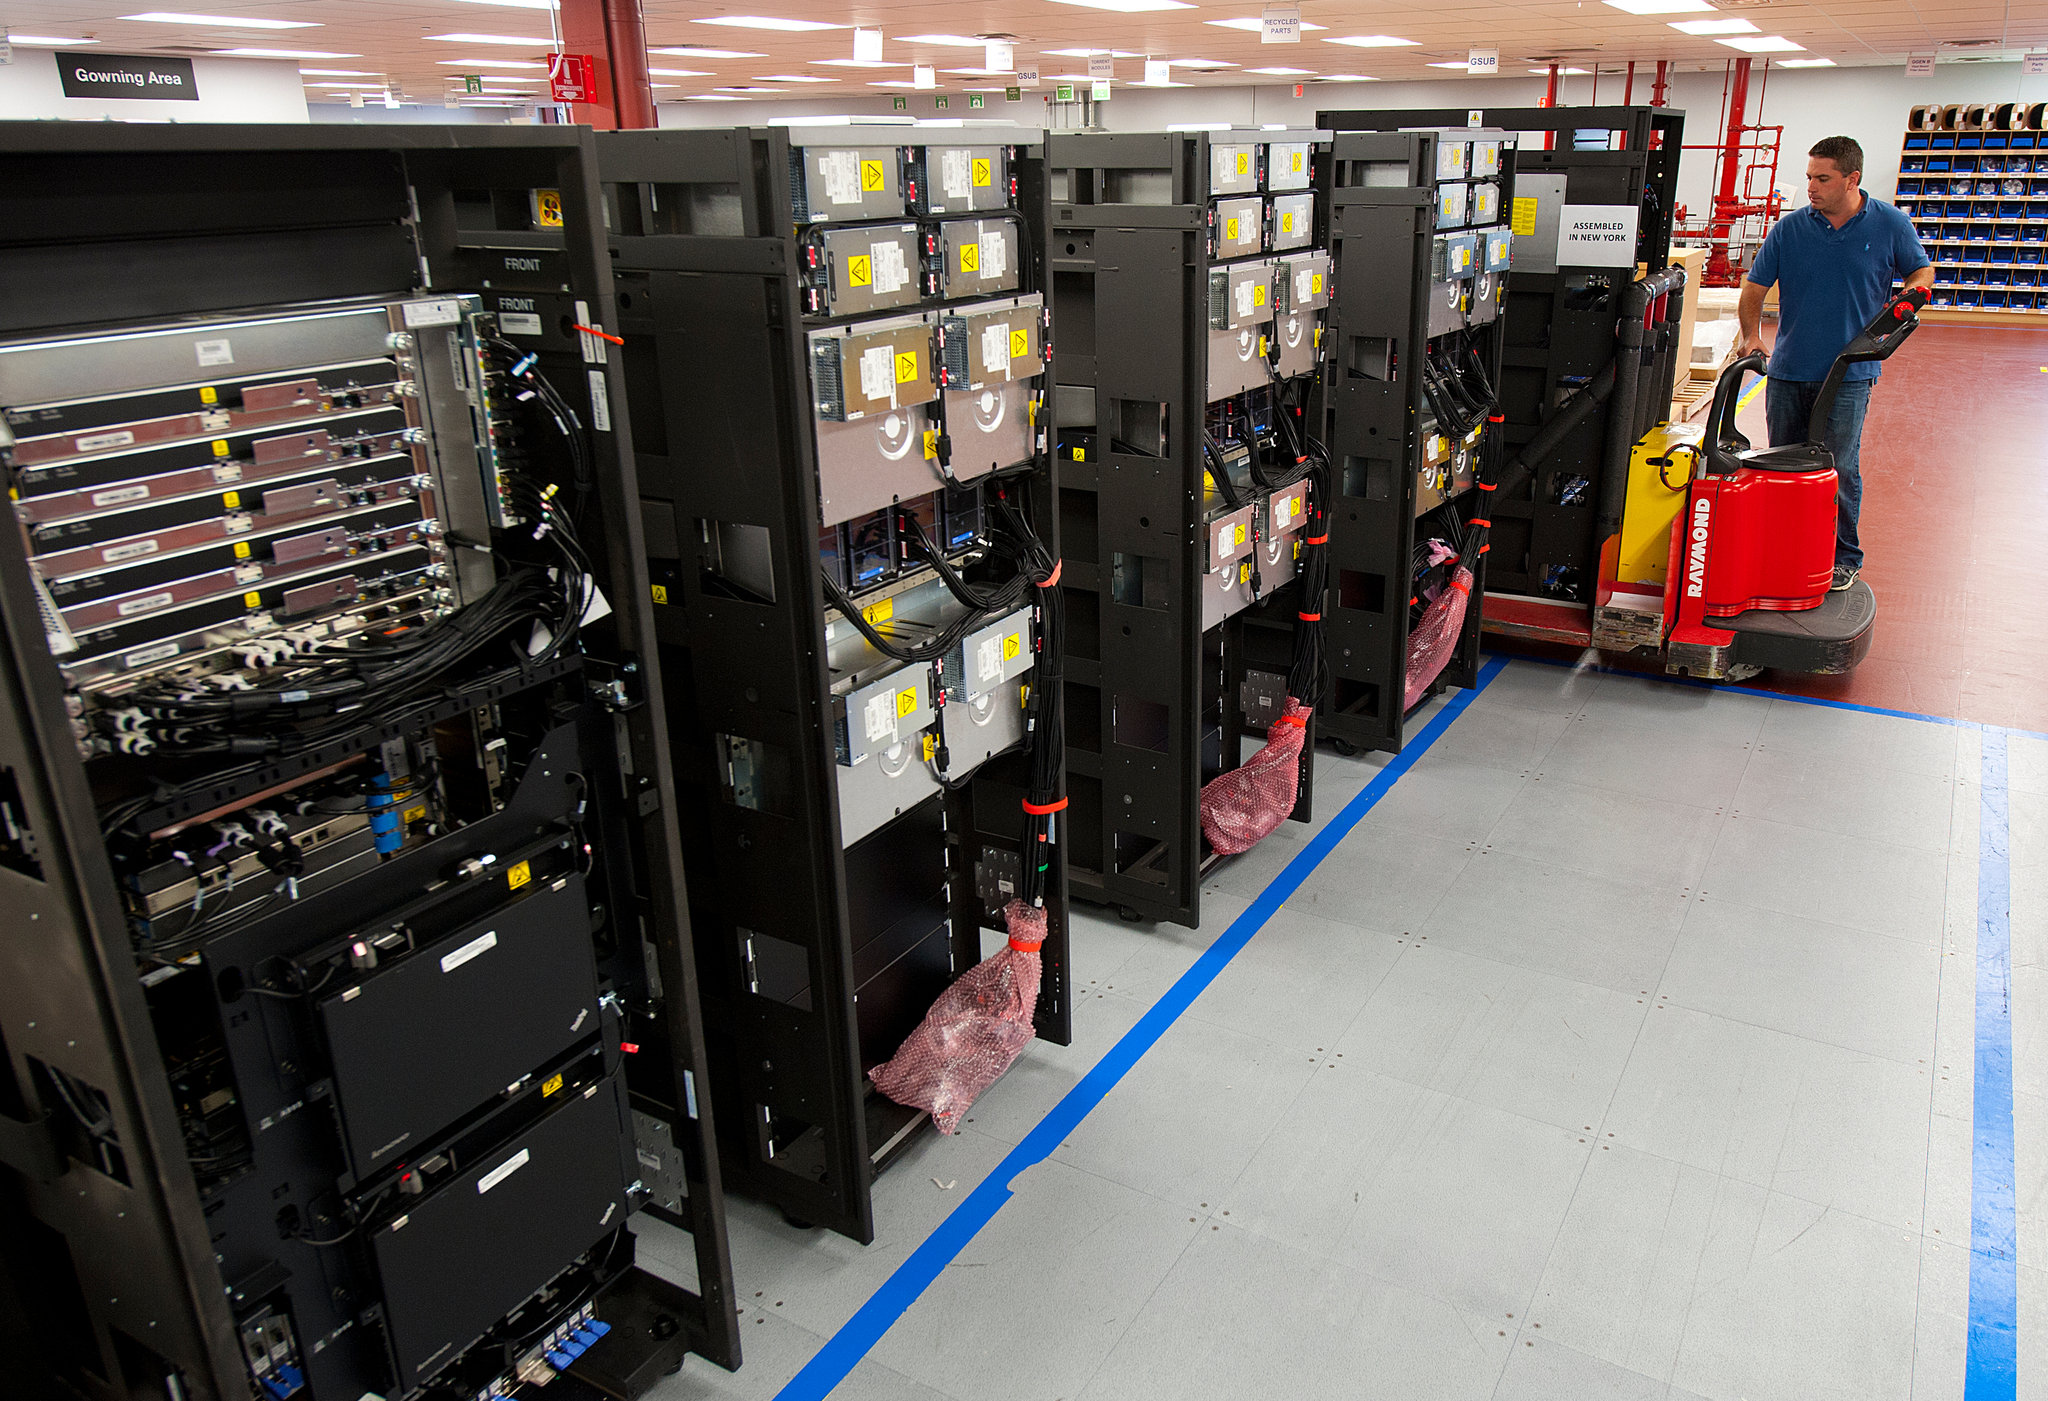 IBM Mainframe Evolves to Serve the Digital World  The